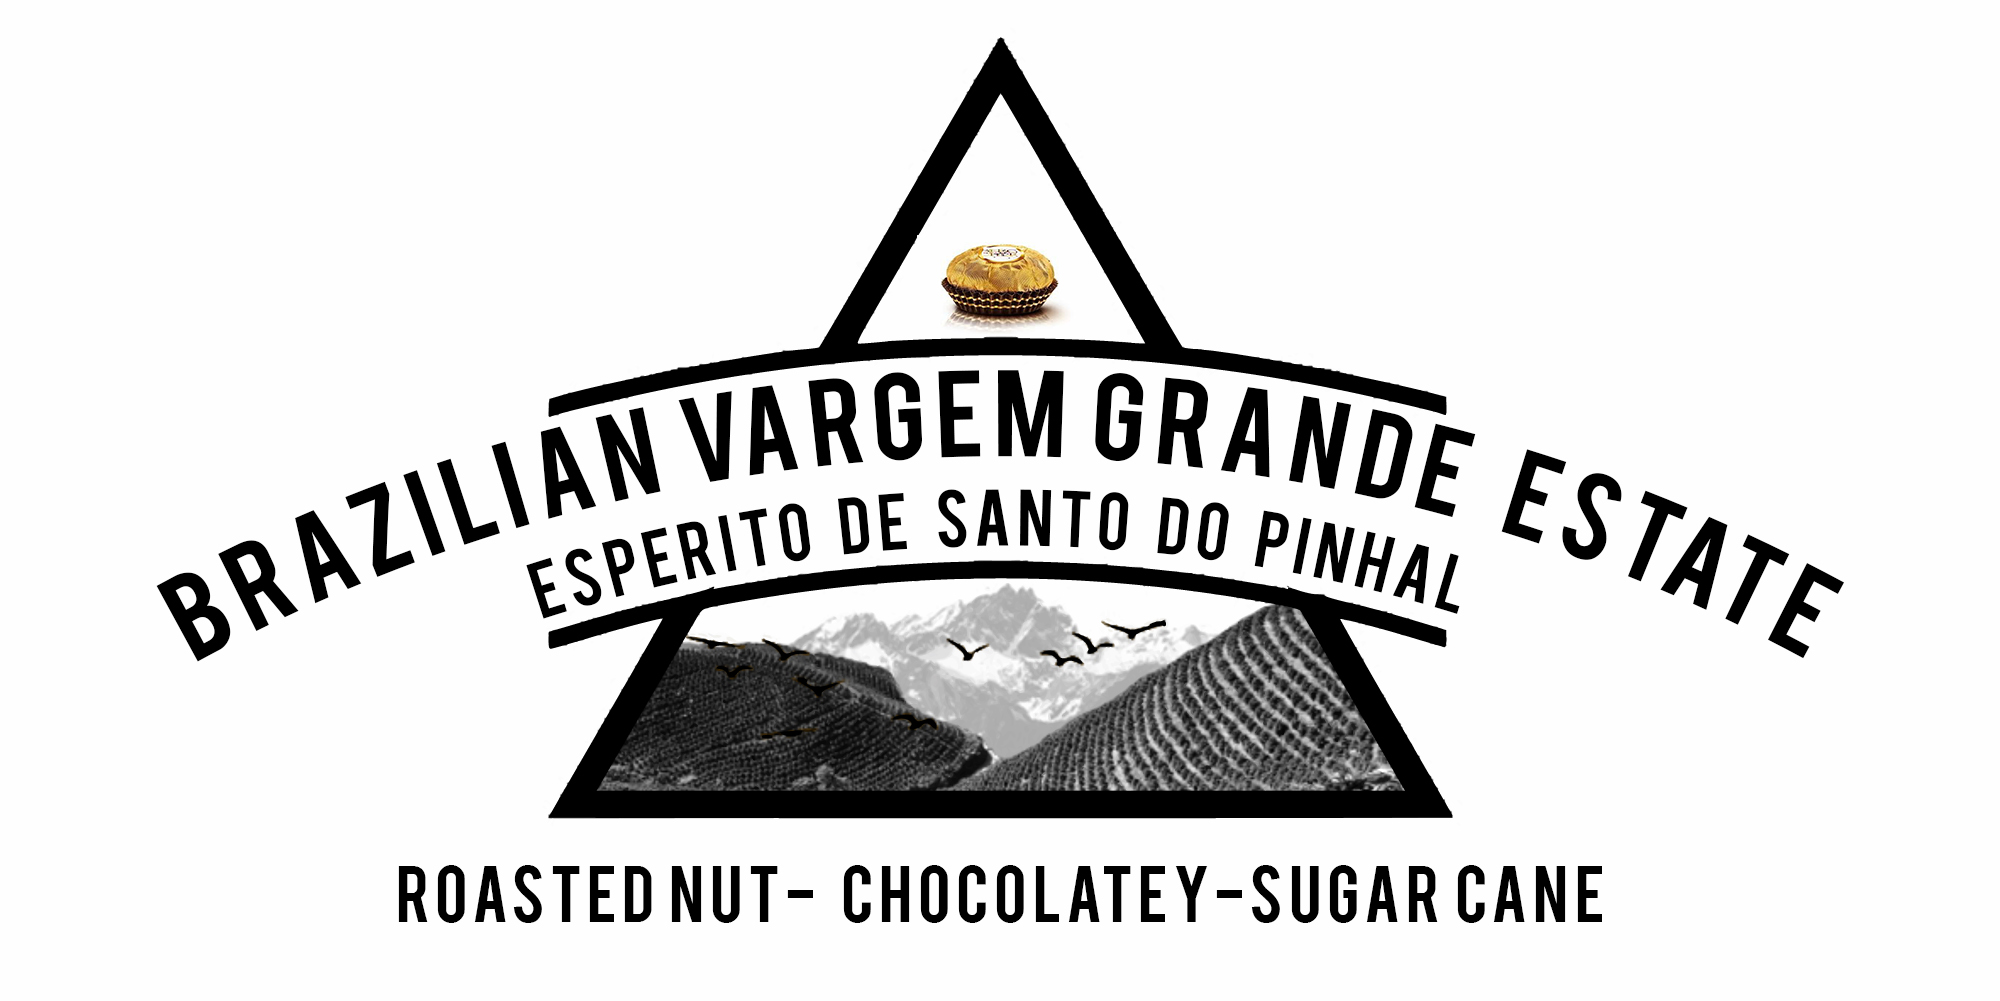 BRAZILIAN VARGEM GRAND ESTATE